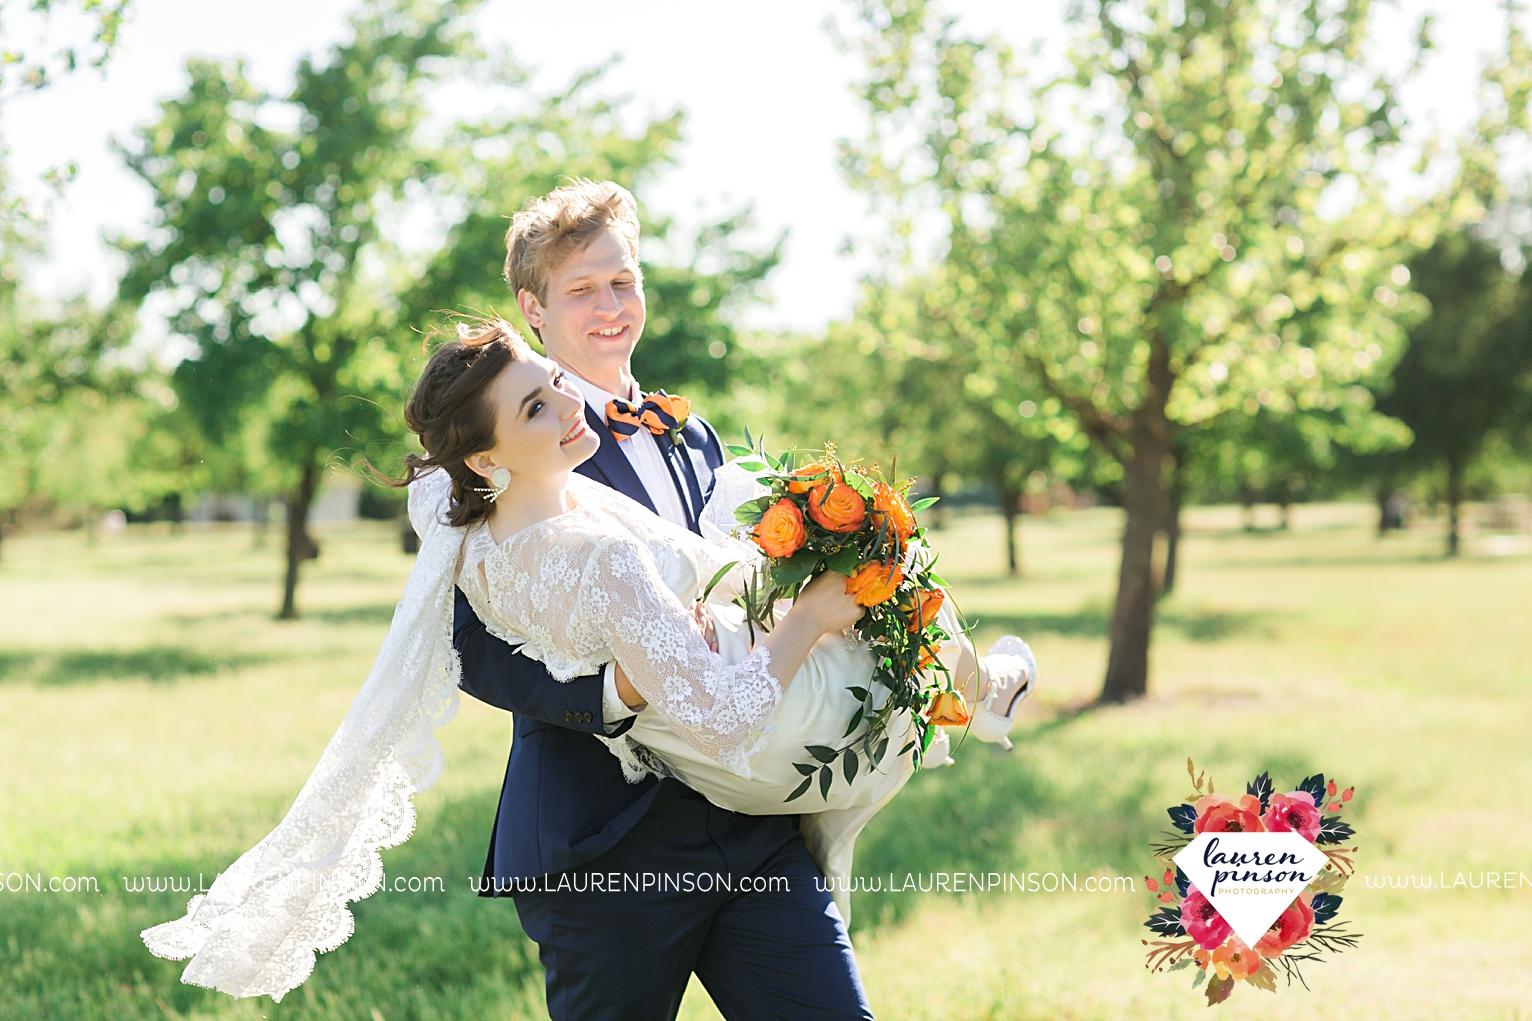 wichita-falls-texas-wedding-photographer-vintage-off-beat-bride-faith-village-church-of-christ-the-plex-roller-skating_2437.jpg